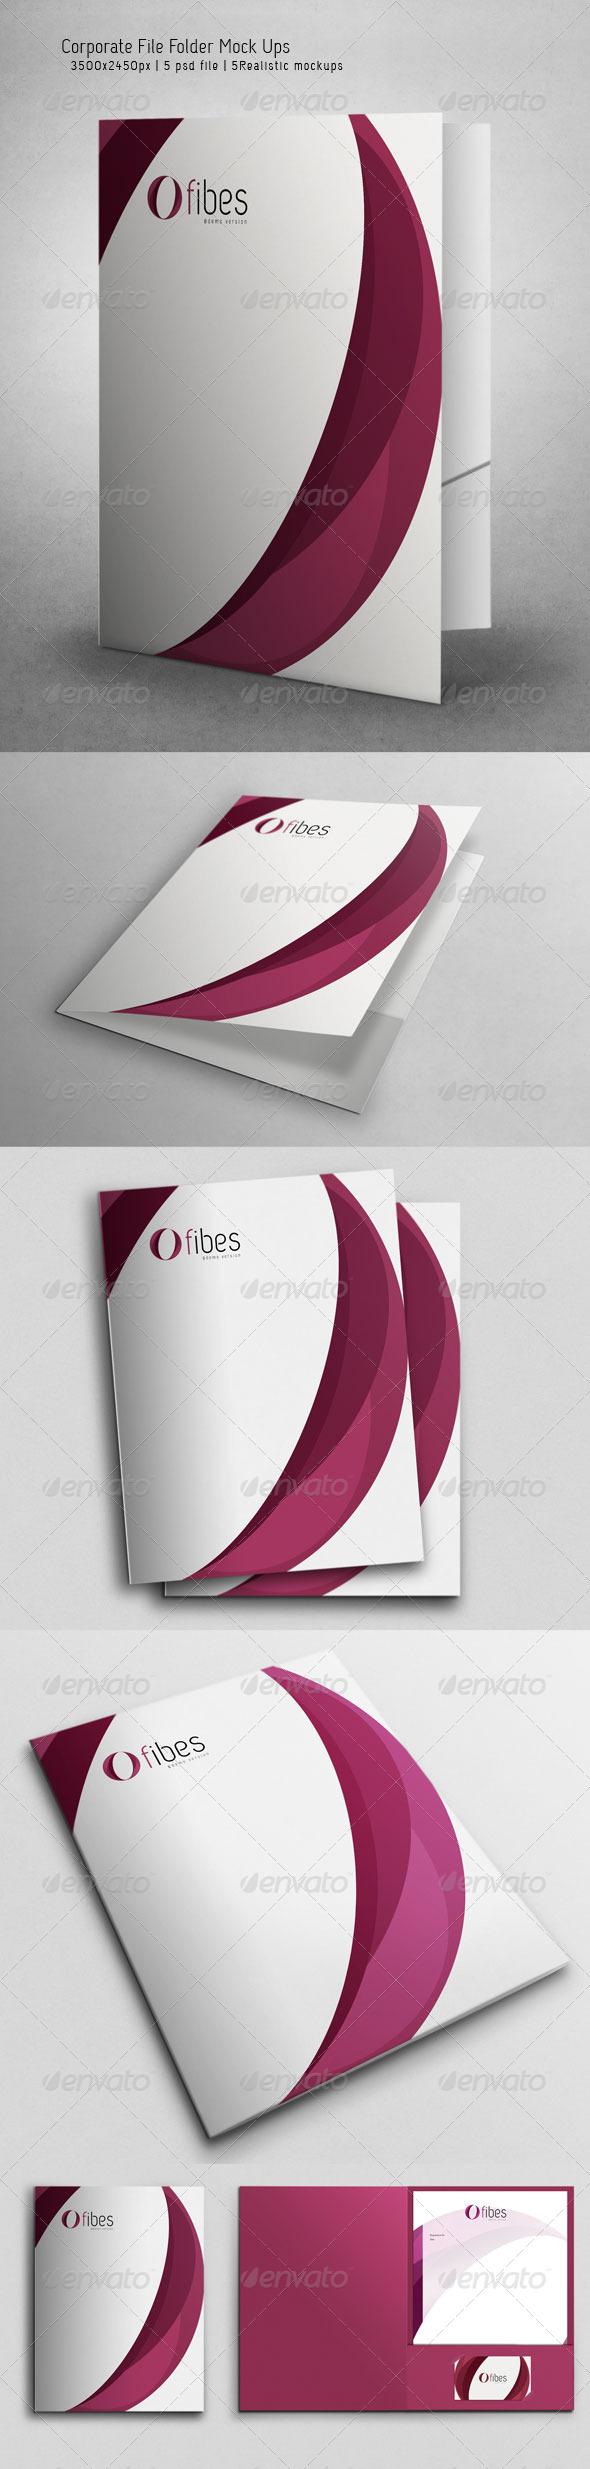 GraphicRiver Corporate File Folder Mock Ups 5672887